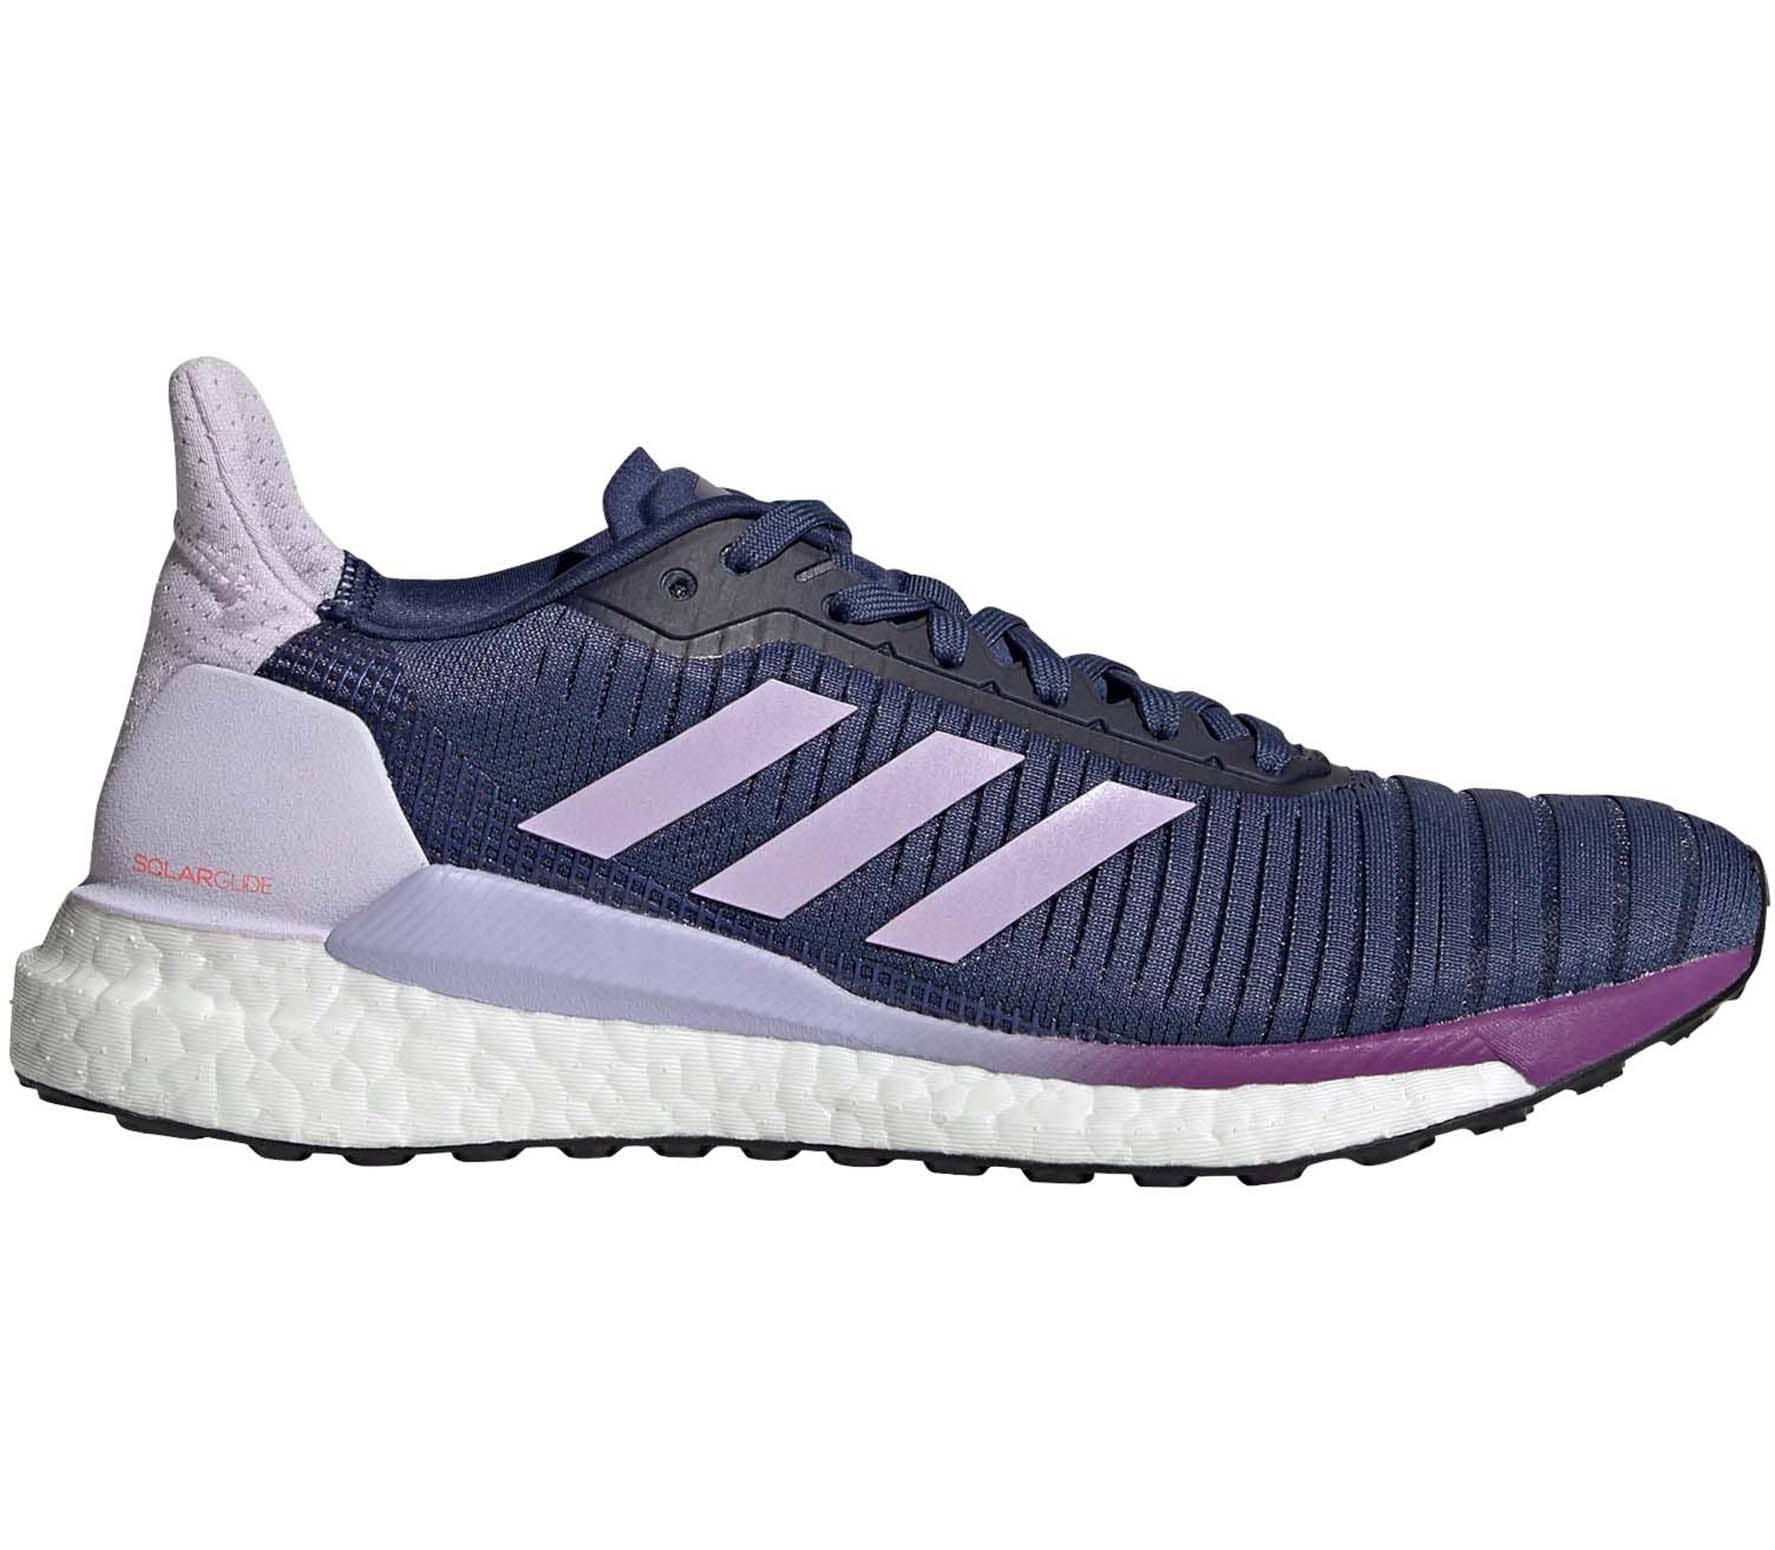 Adidas Solar Glide 19 Shoes Running - Women